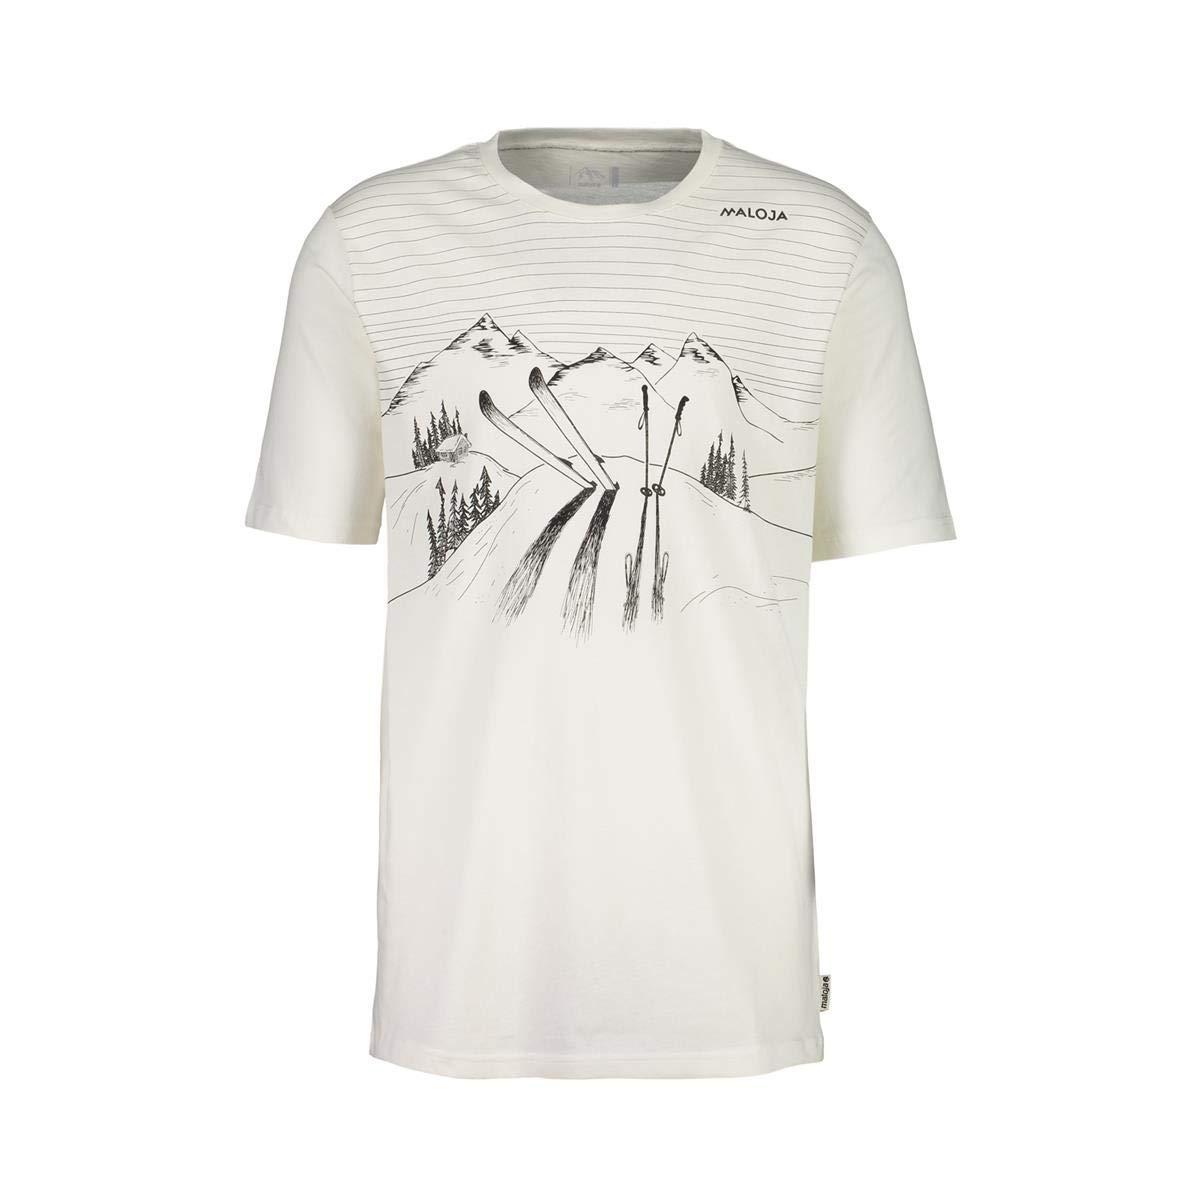 Herren Maloja ernestm Shirt